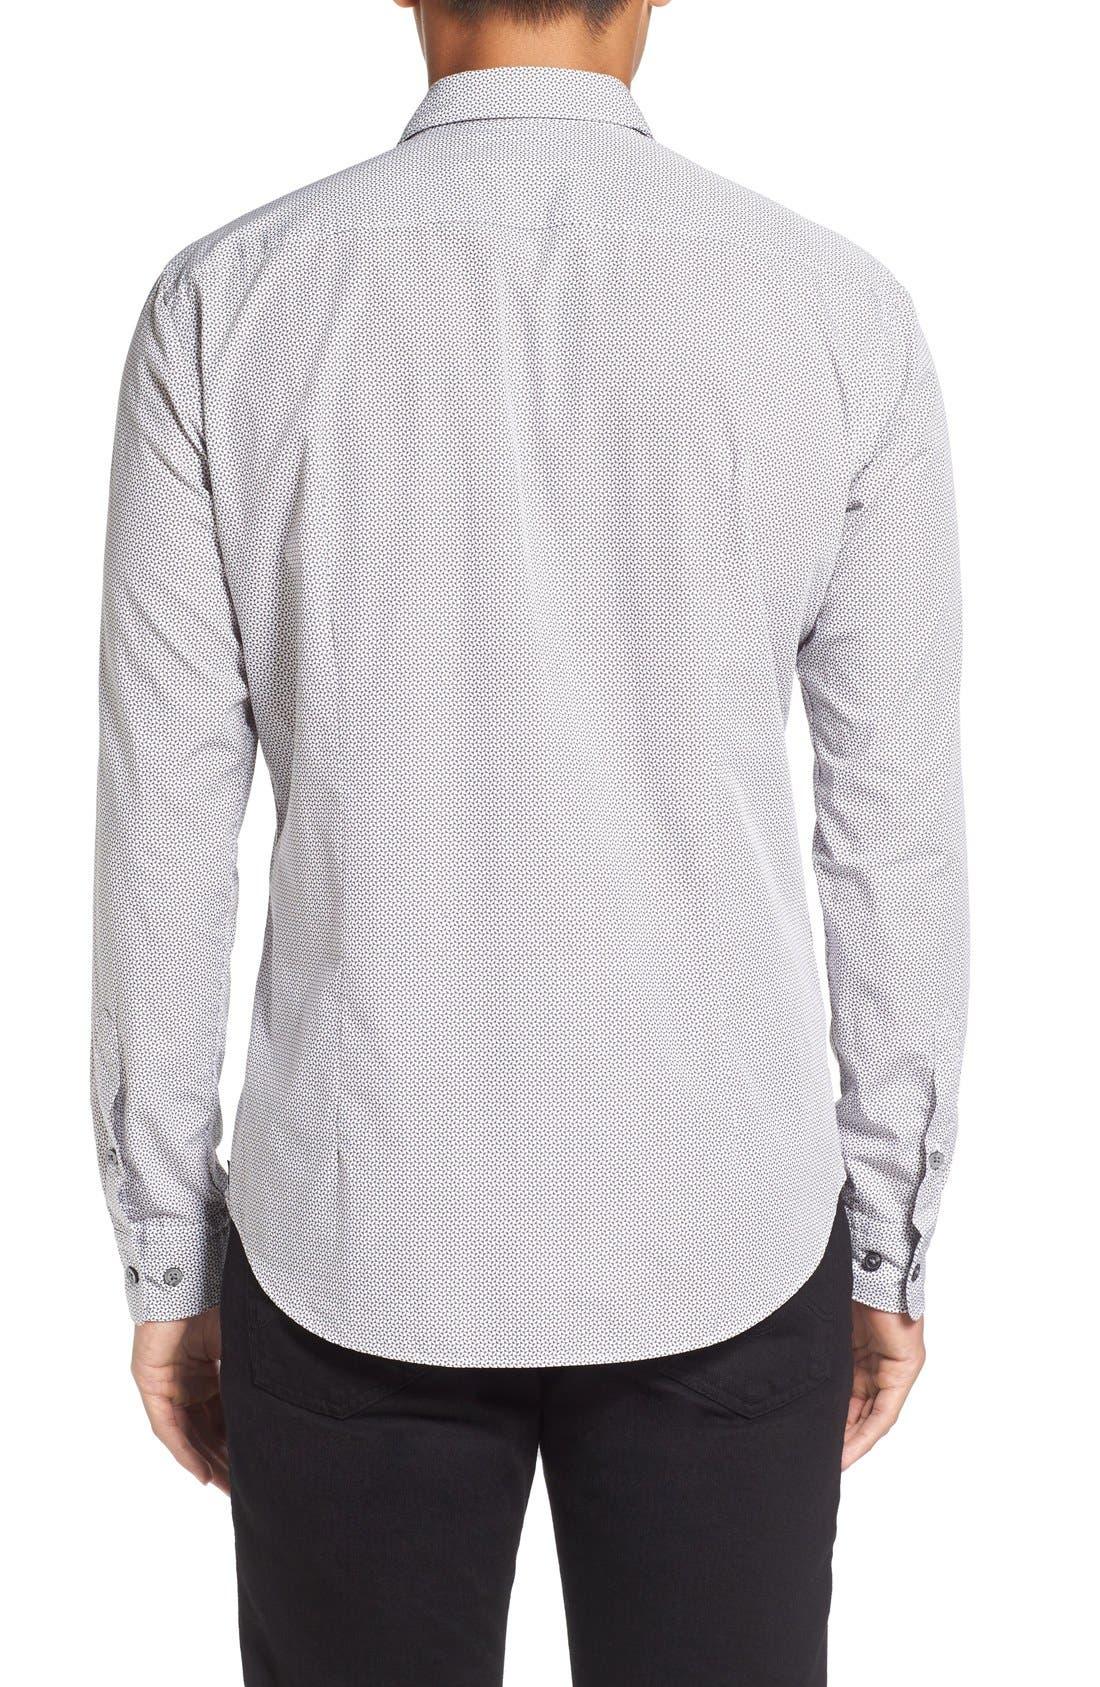 'Robbie' Sharp Fit Graphic Print Sport Shirt,                             Alternate thumbnail 2, color,                             069